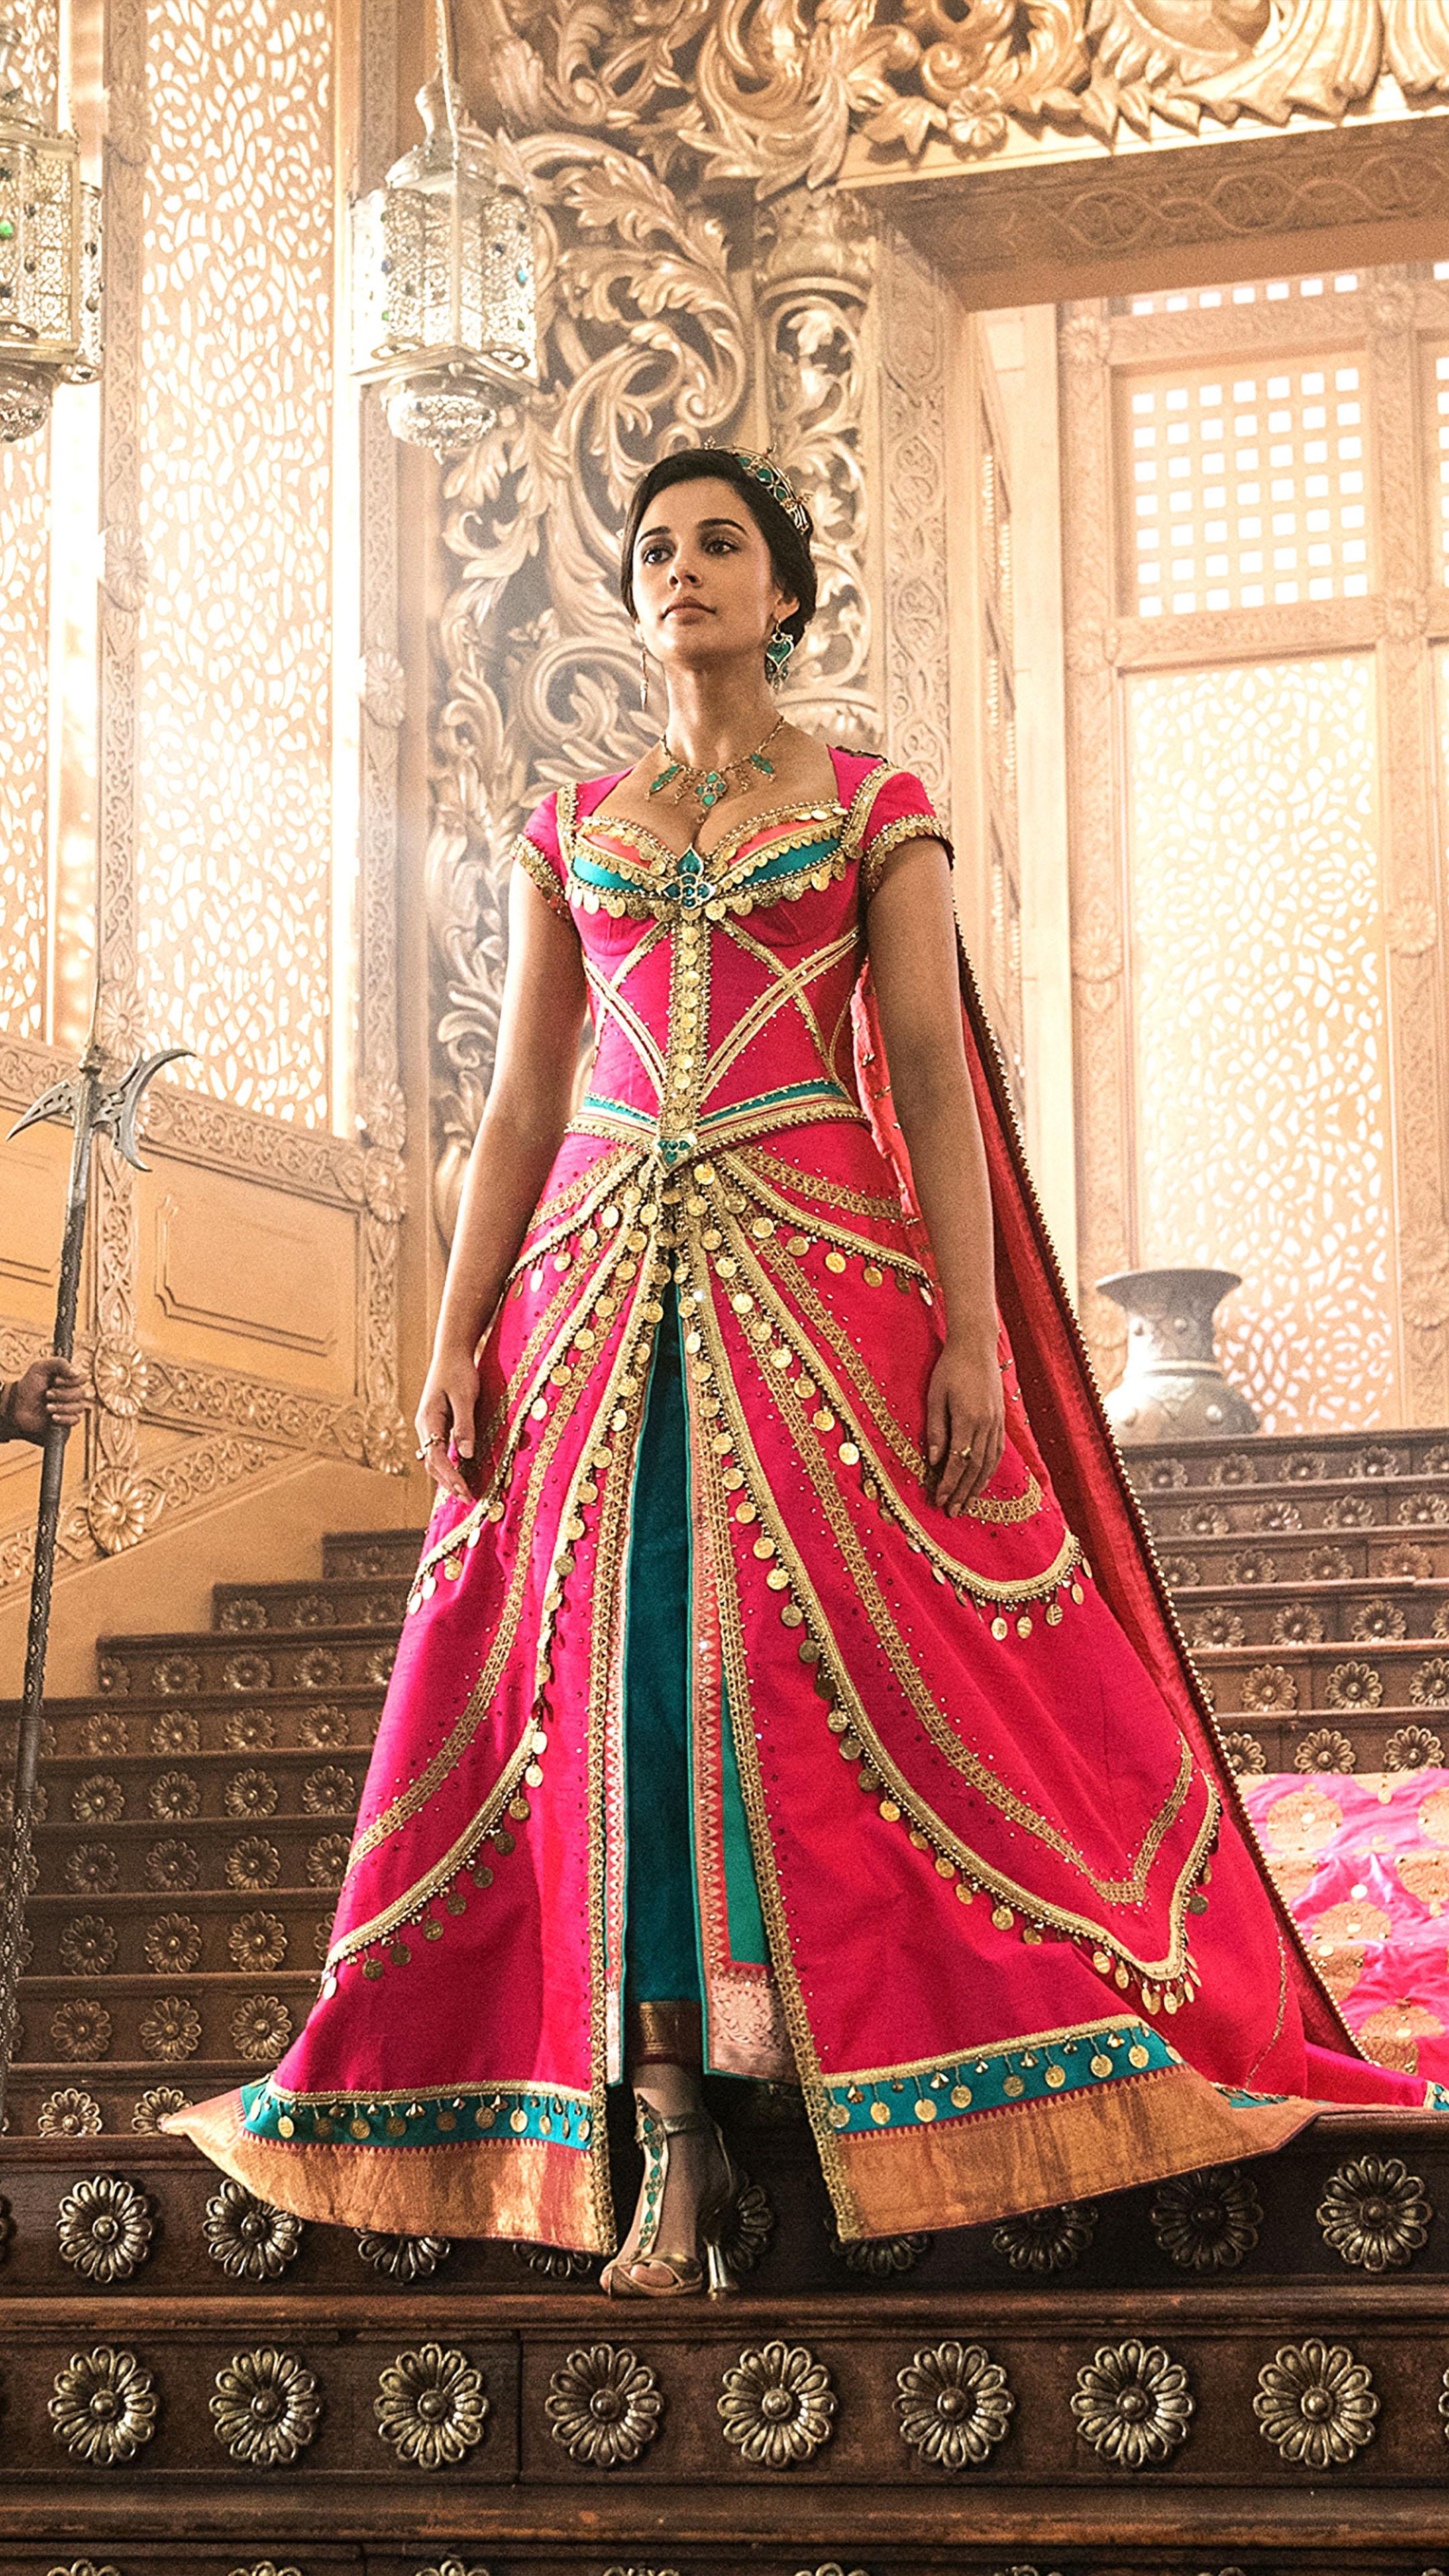 Download Princess Jasmine In Aladdin Naomi Scott Pure 4K 2160x3840